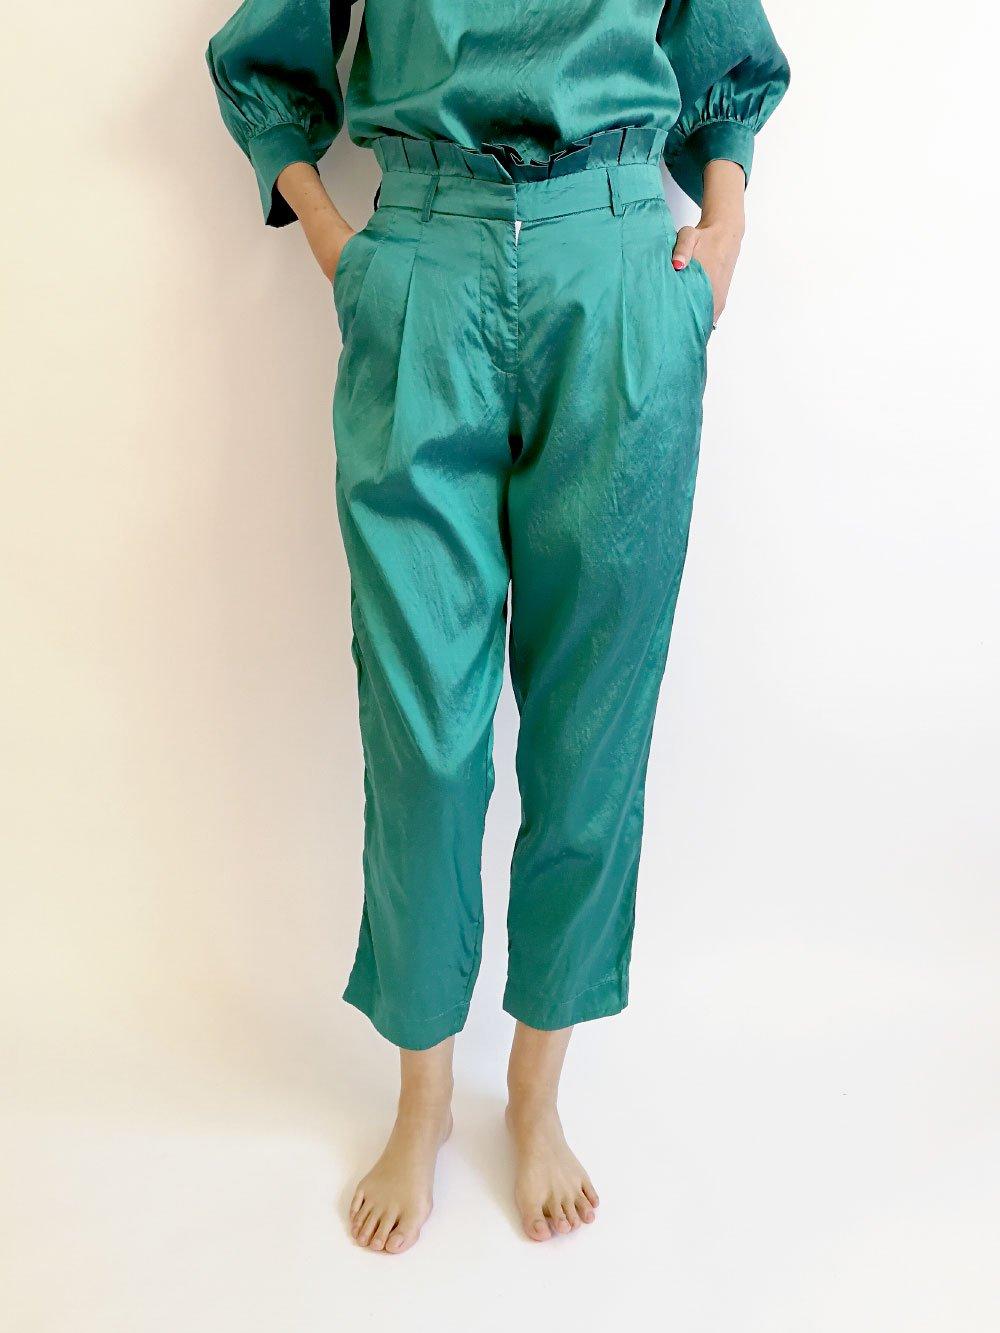 Tucked Pants / original blue